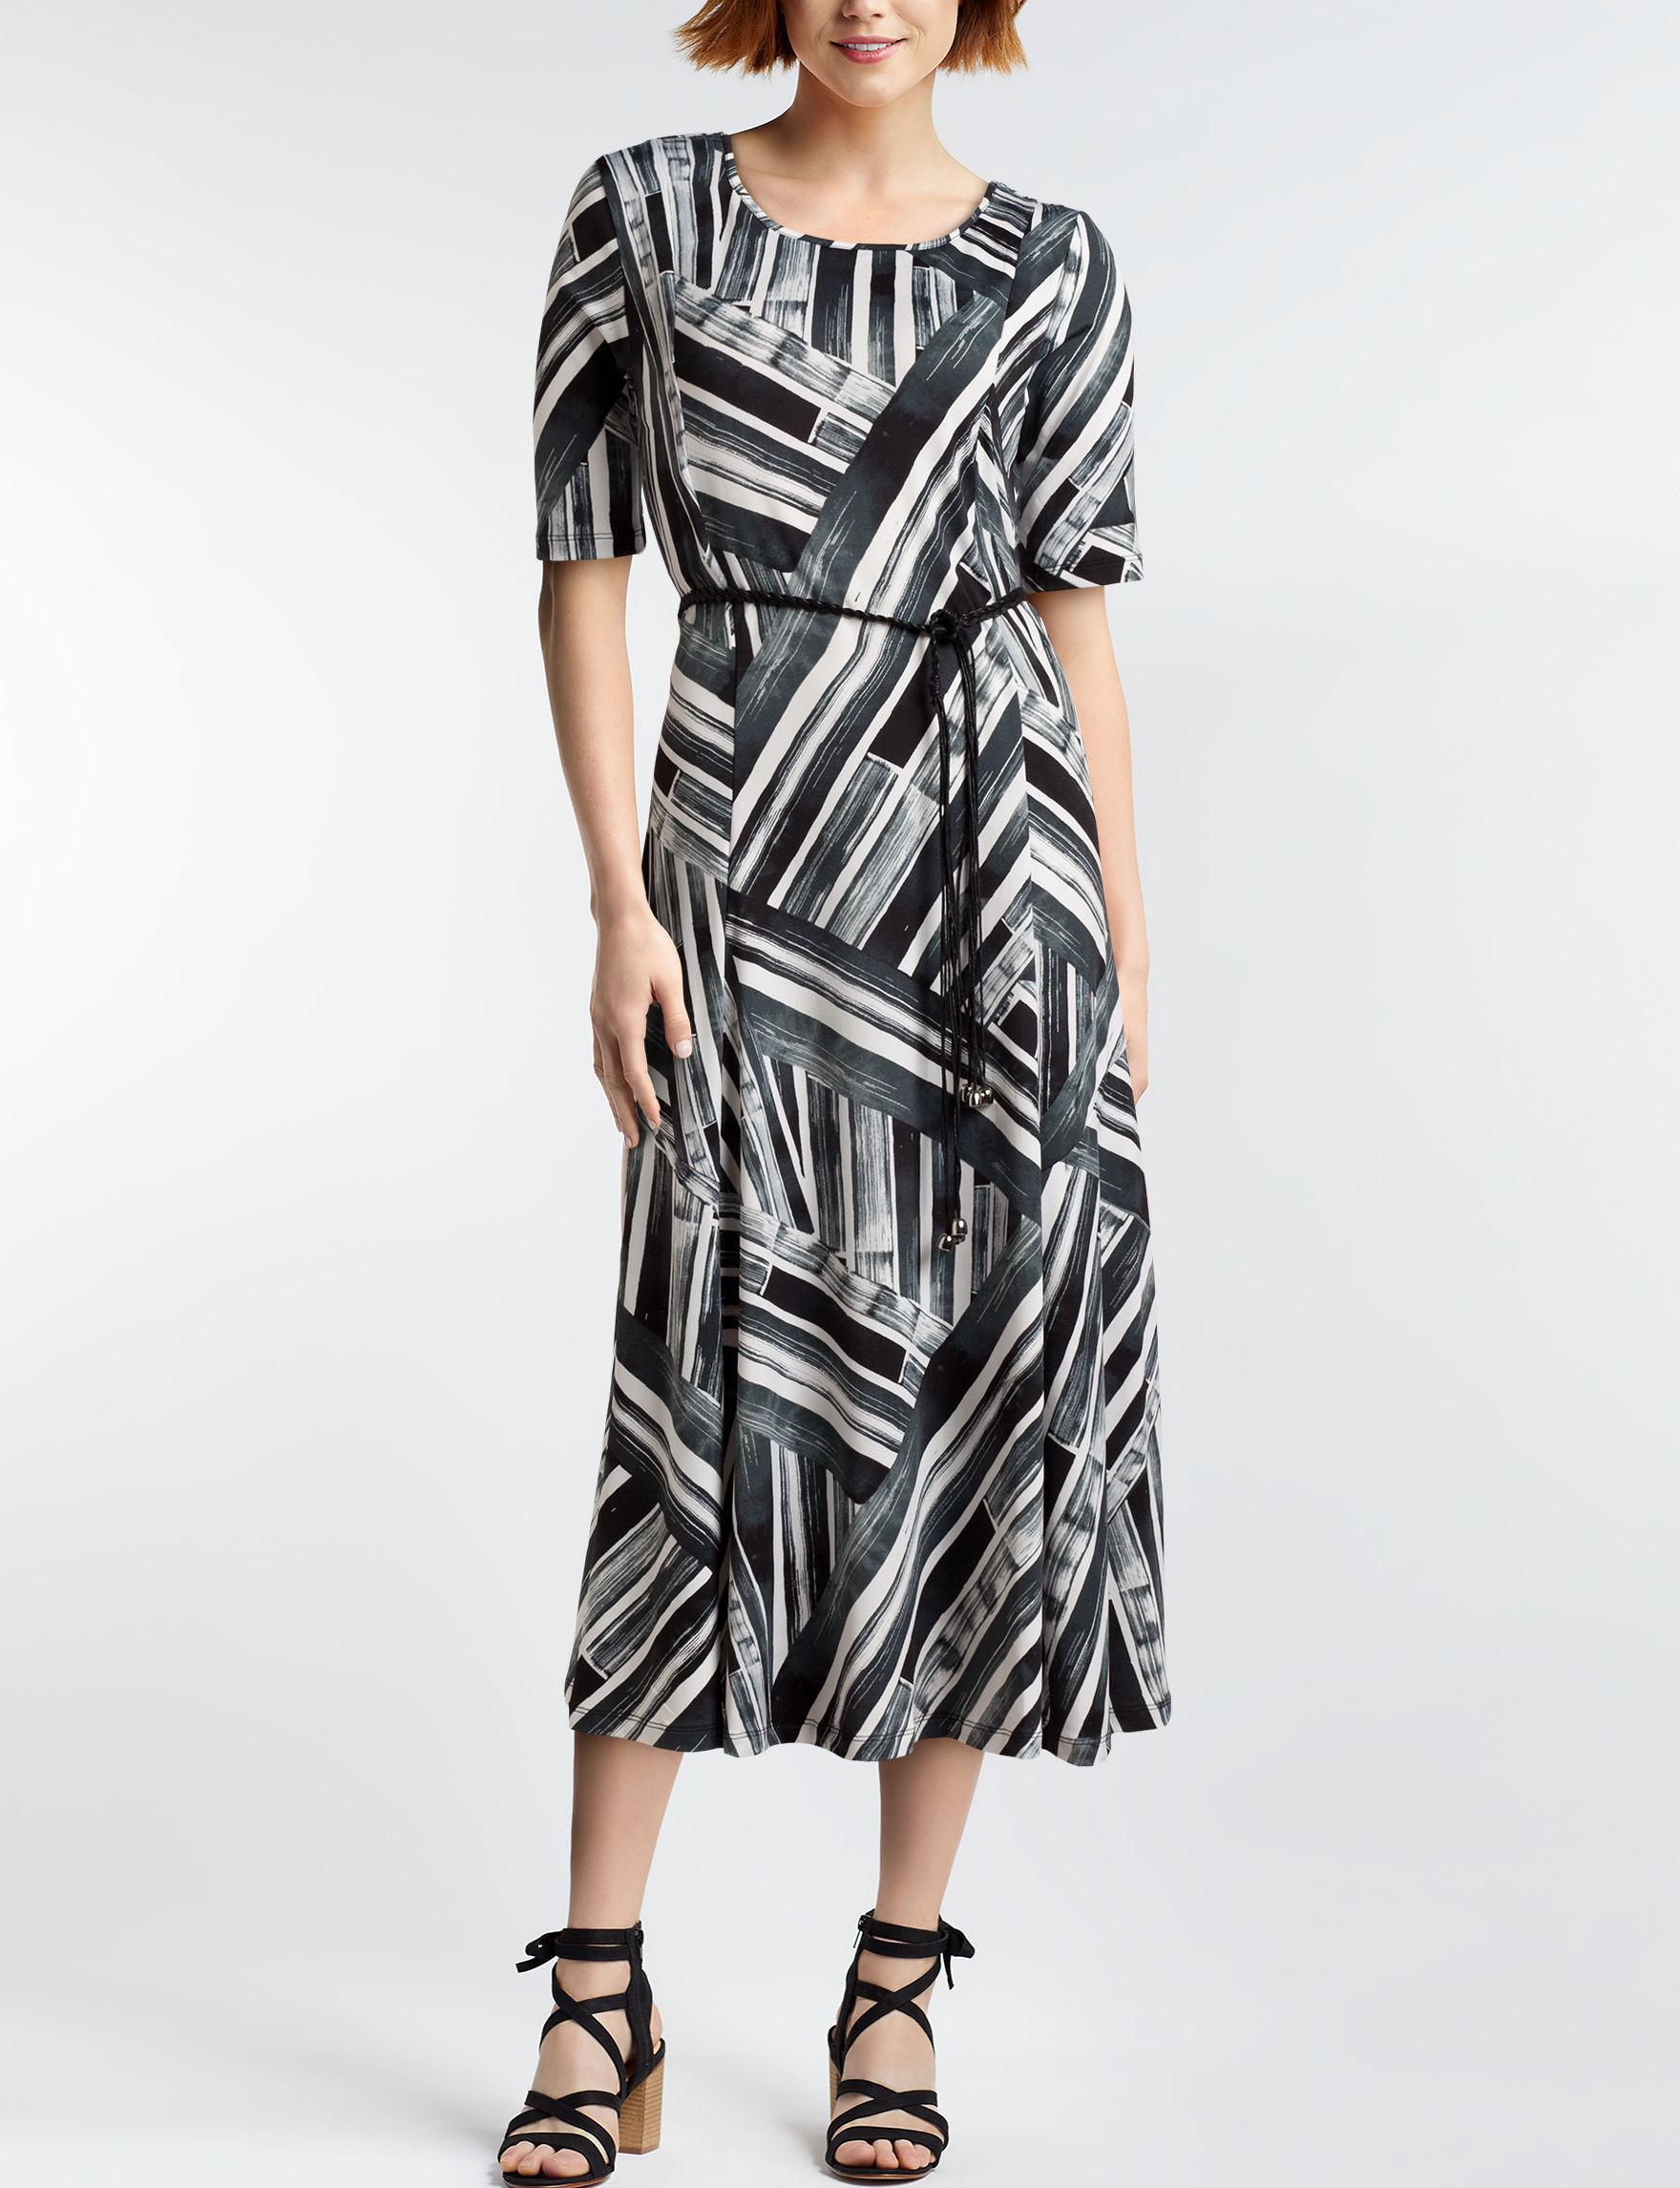 Nina Leonard Black / Ivory Everyday & Casual A-line Dresses